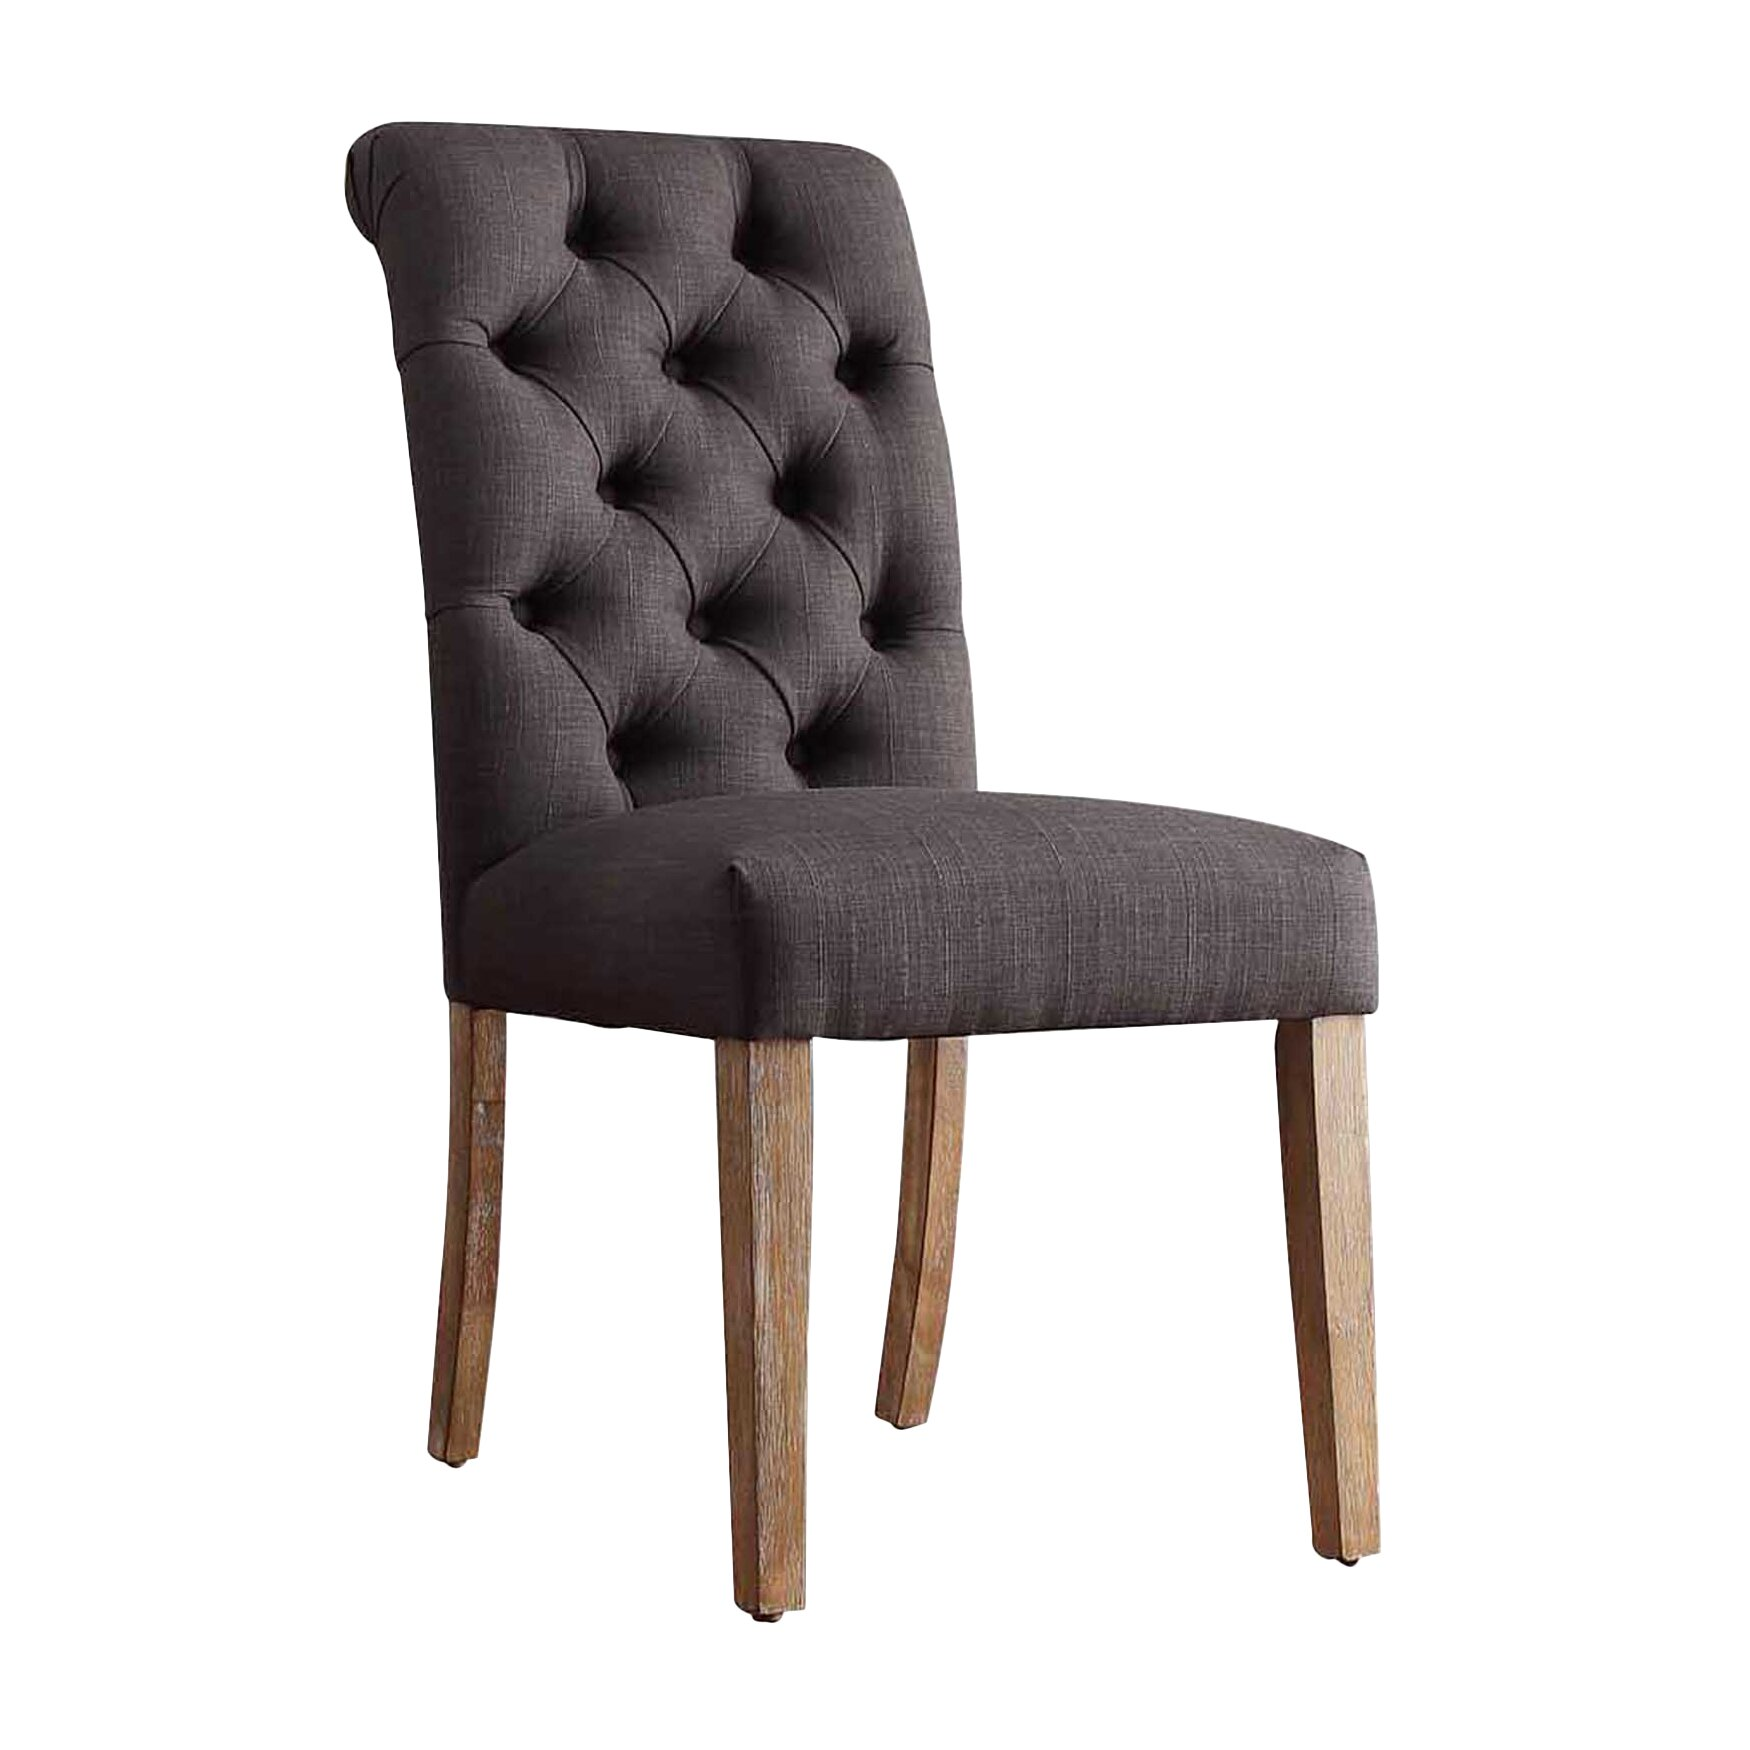 Lark Manor Pompon Tufted Side Chair Amp Reviews Wayfair